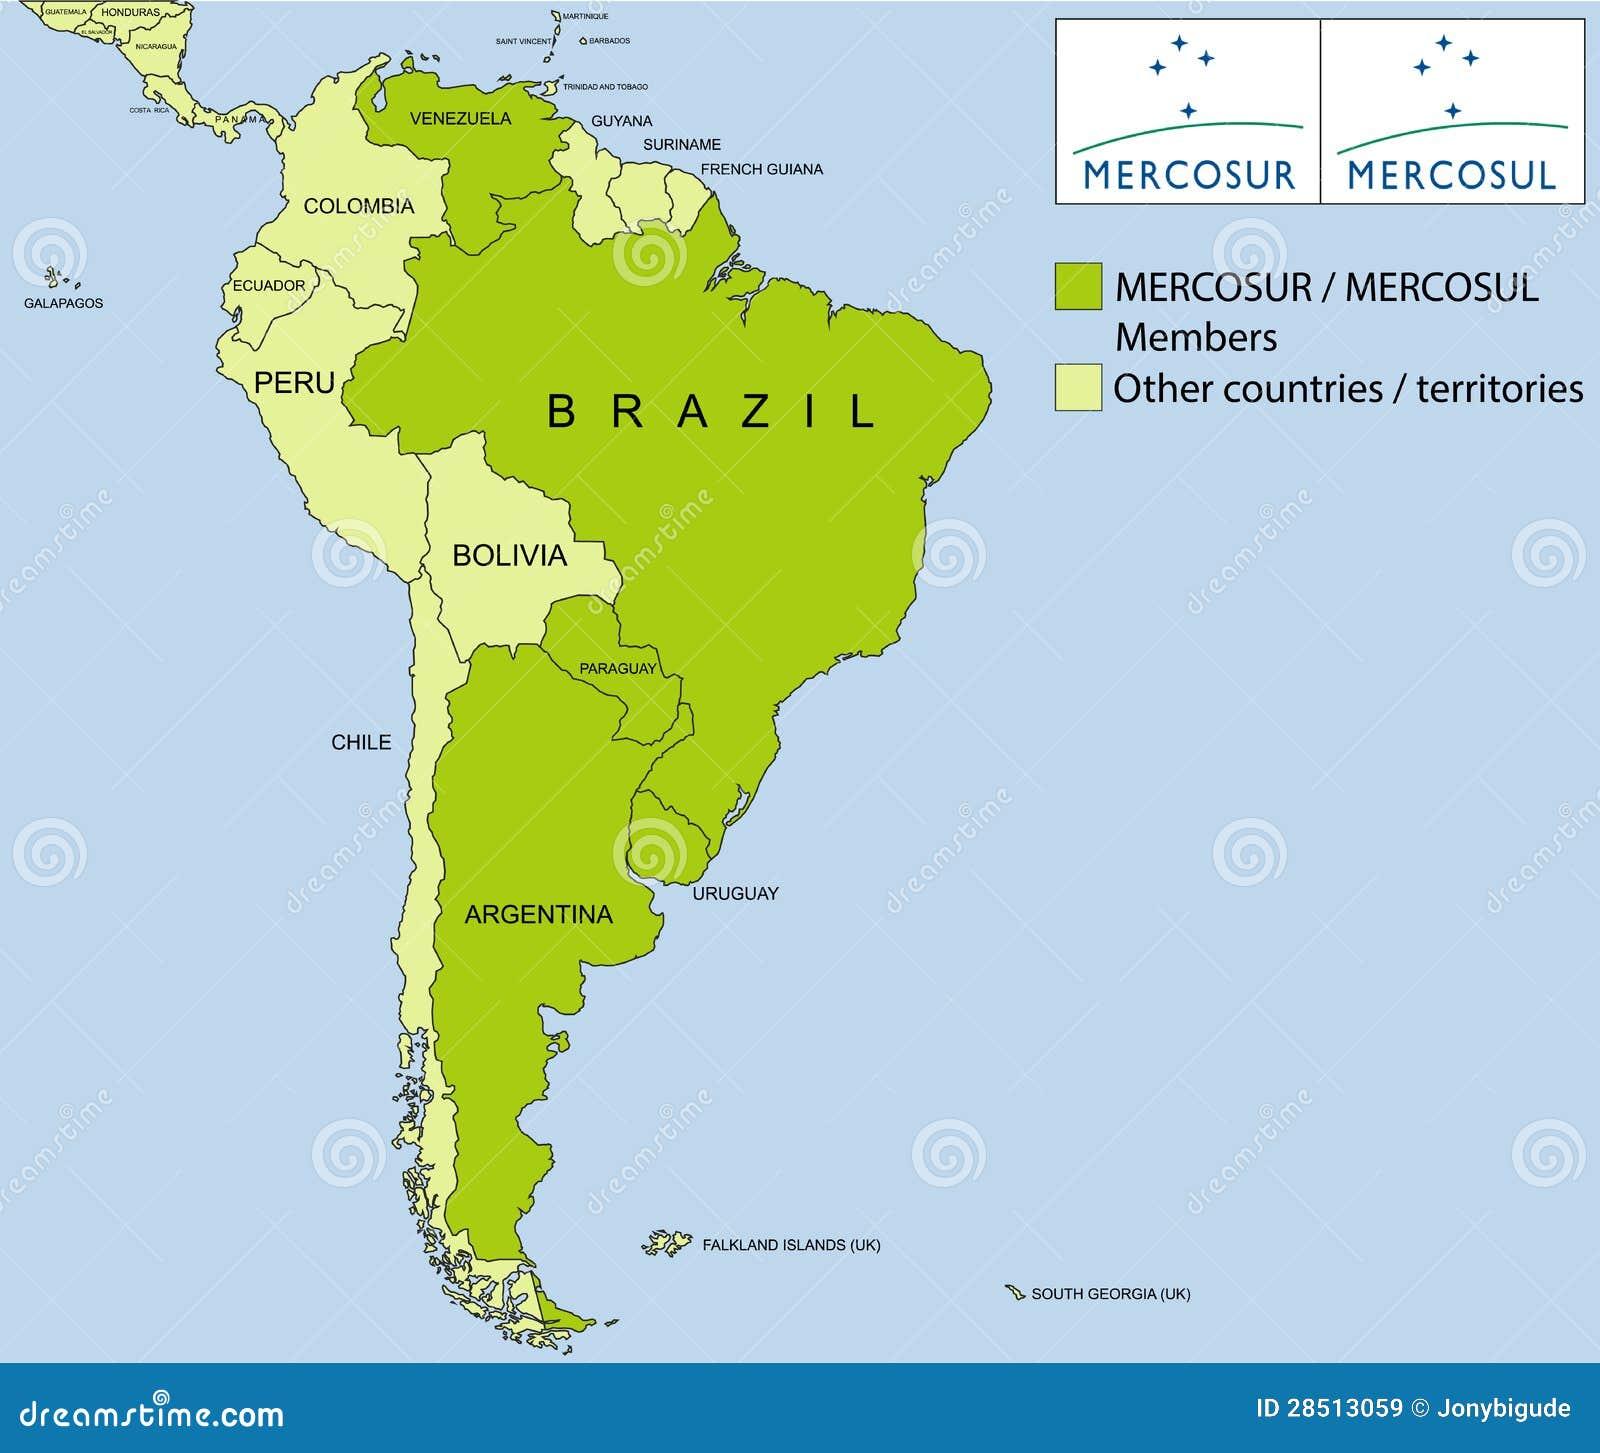 MERCOSUR/MERCOSUL Organization Royalty Free Stock Images - Image ...